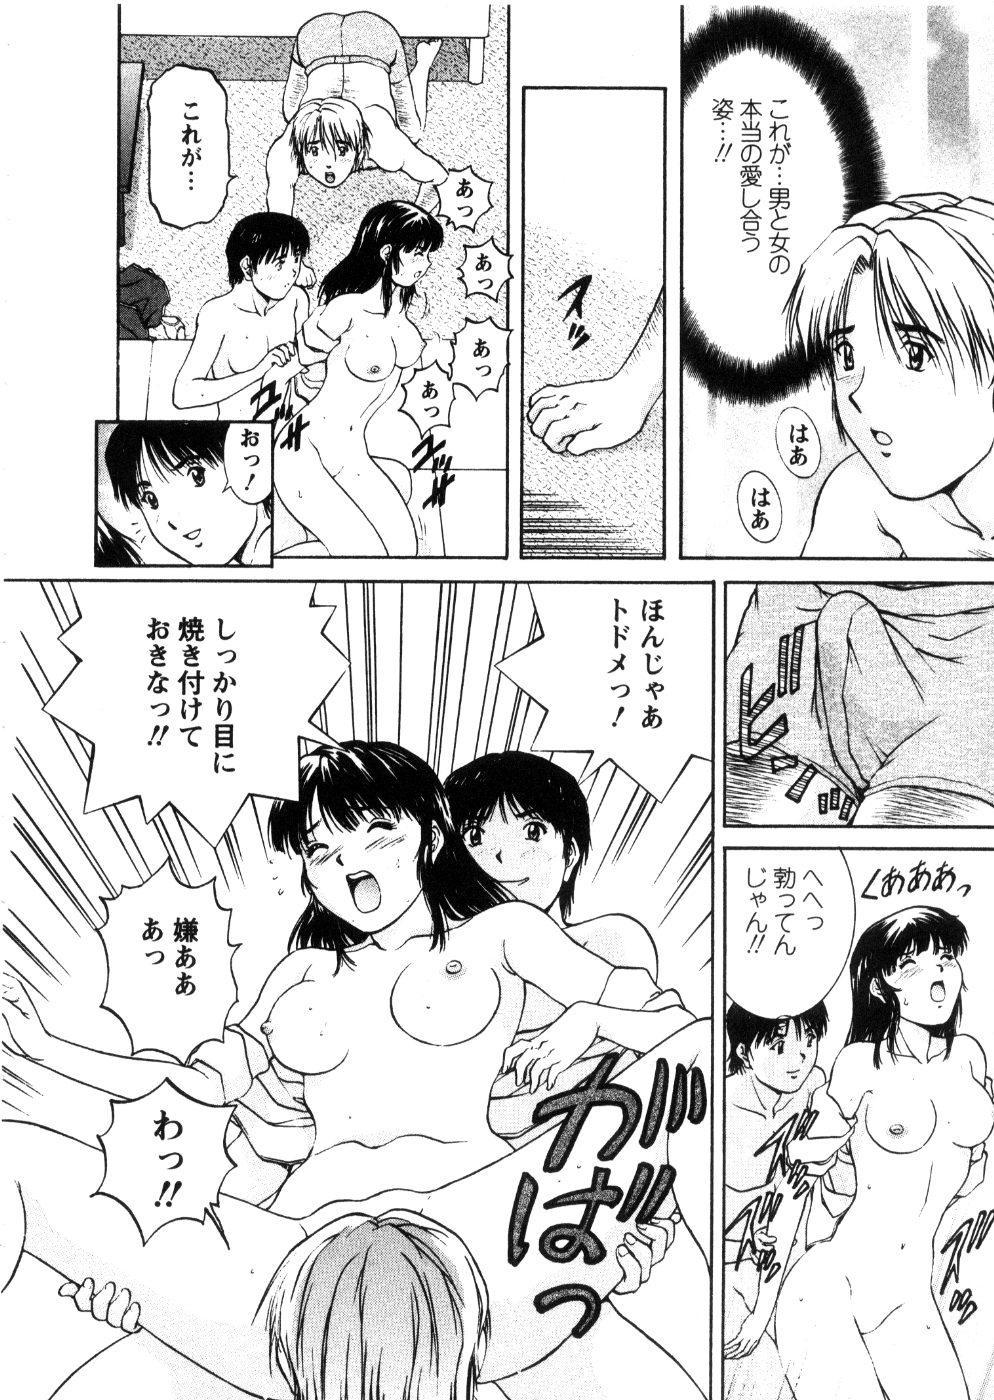 Oneechan-tachi ga Yatte Kuru 03 167